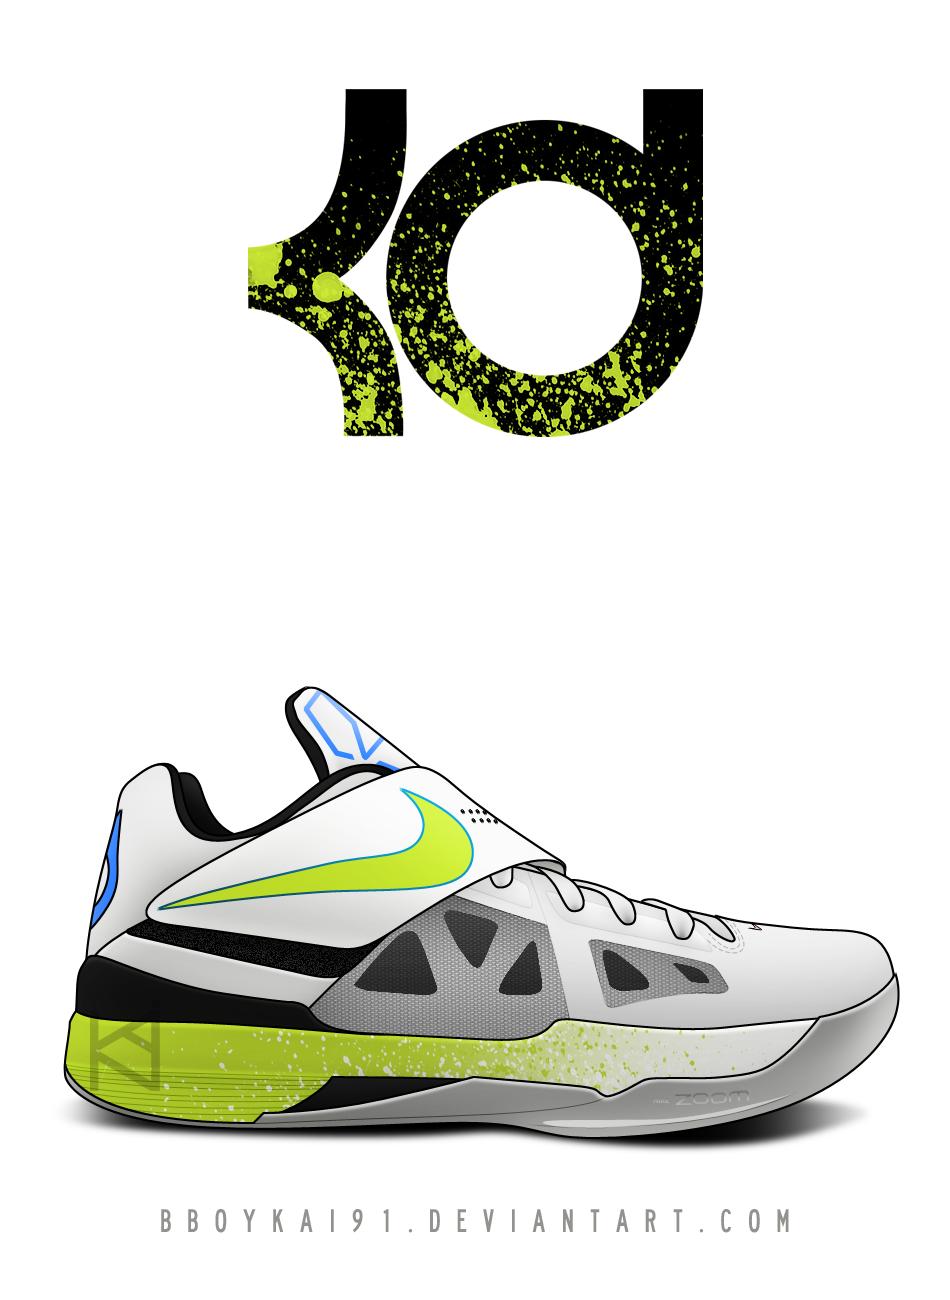 Nike Zoom KD IV 'Neon' by BBoyKai91